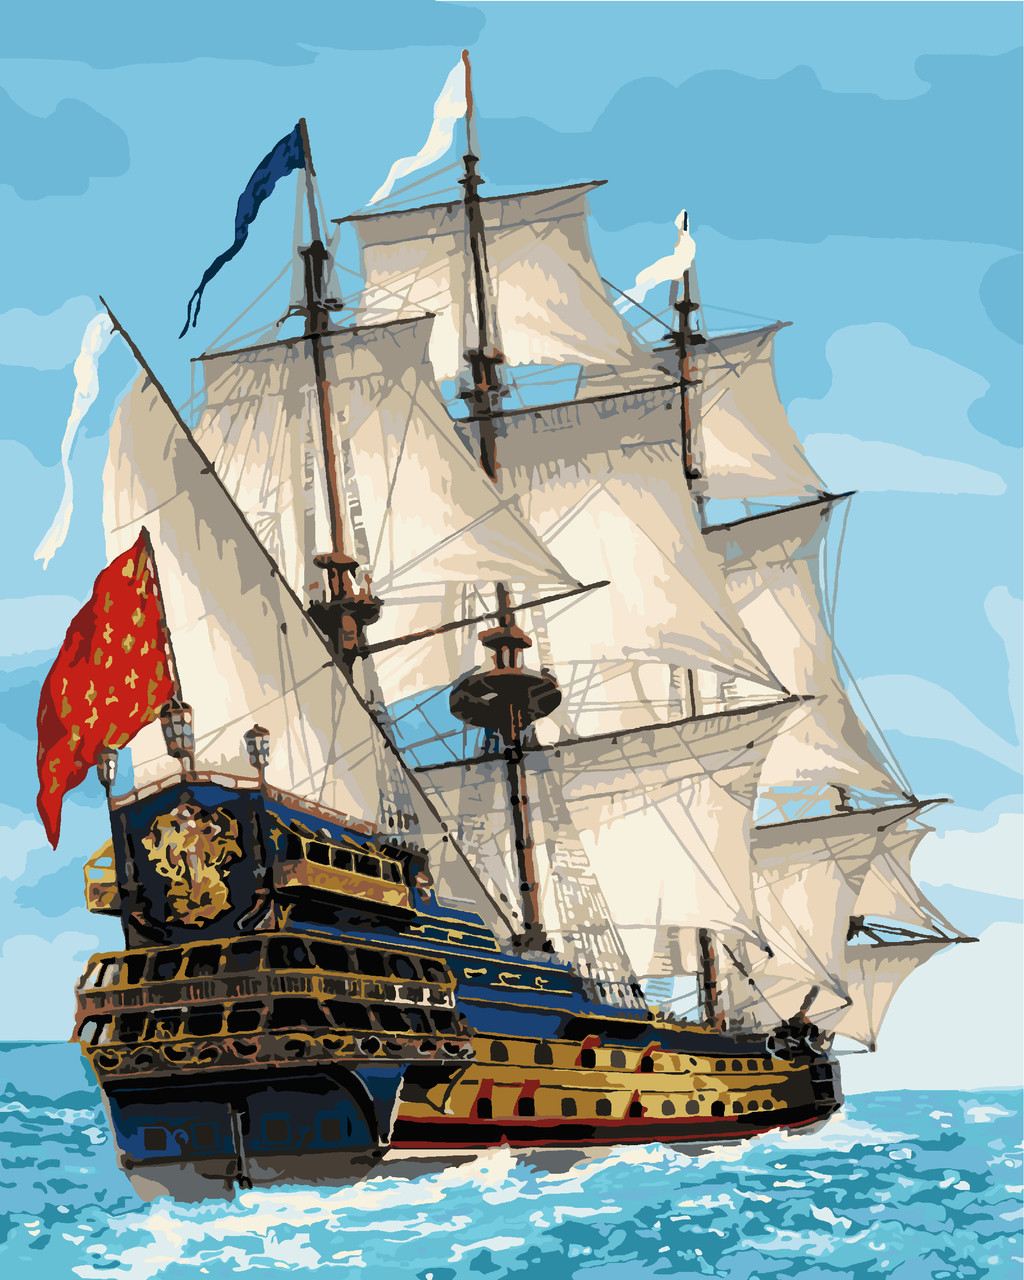 Картина по номерам Идейка Королевский флот 40*50 см (без коробки) арт.KHO2729